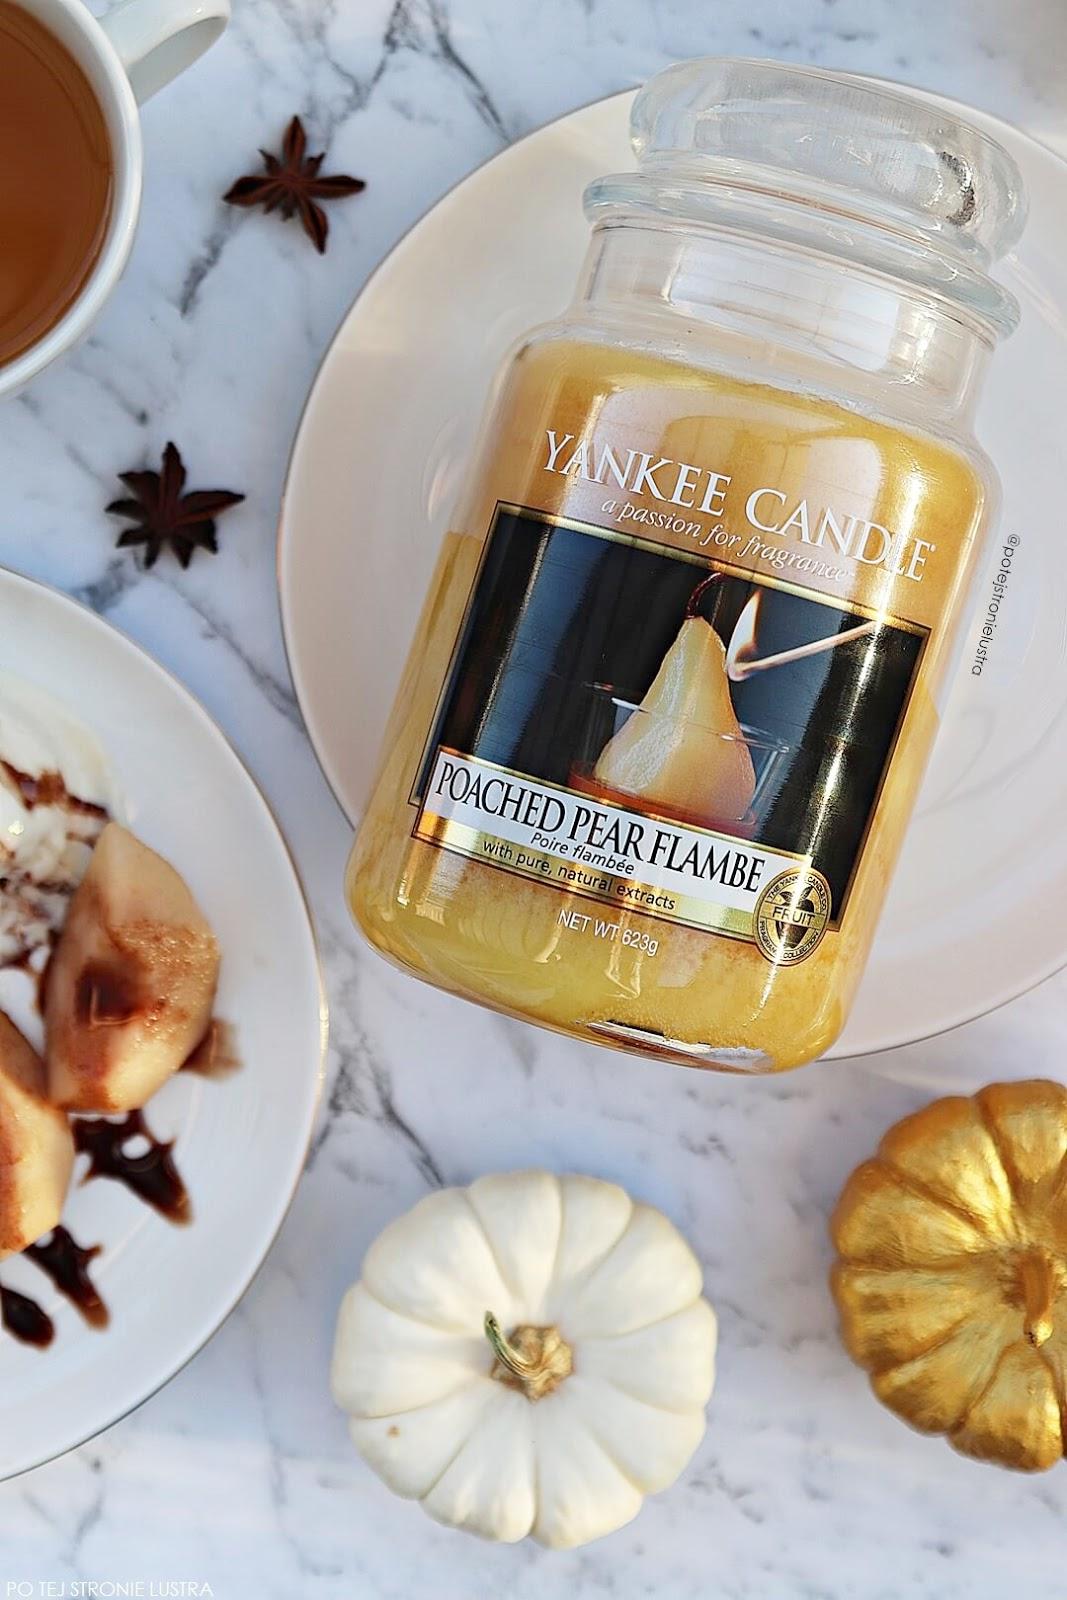 yankee candle poached pear flambe jesień 2018